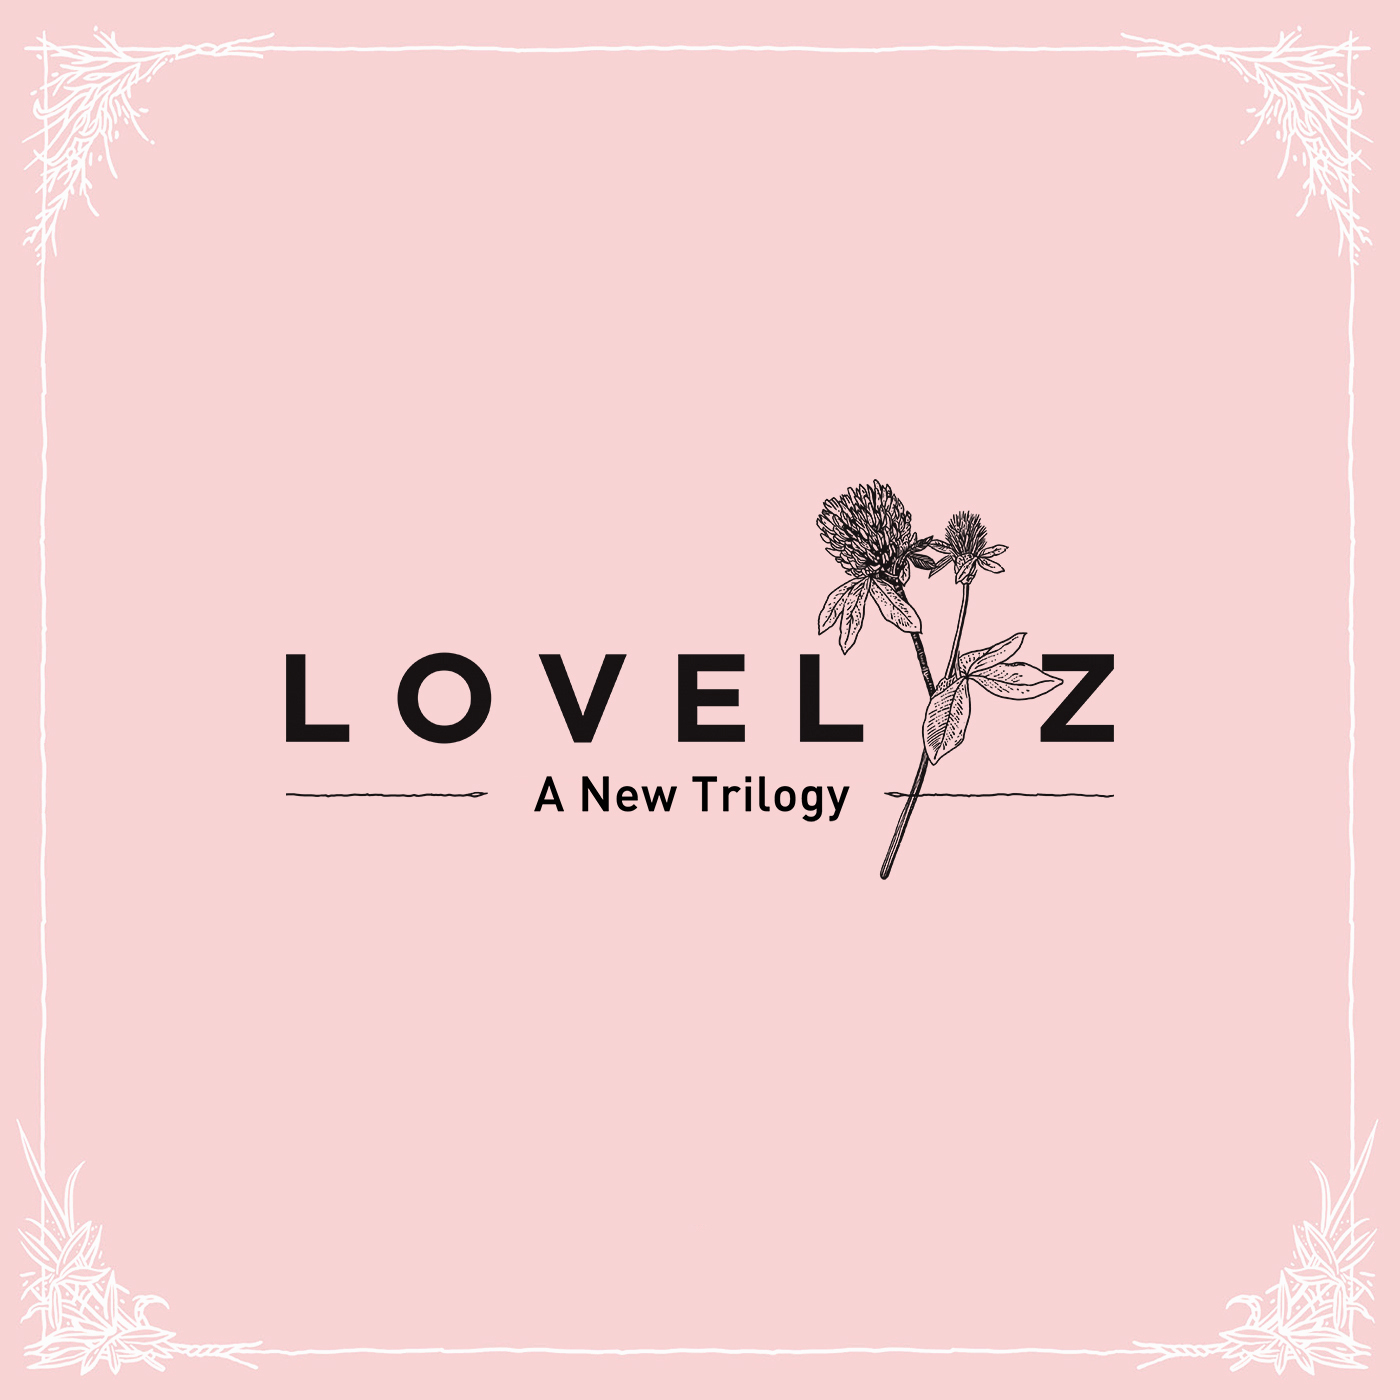 20160425.17 Lovelyz - A New Trilogy cover.jpg